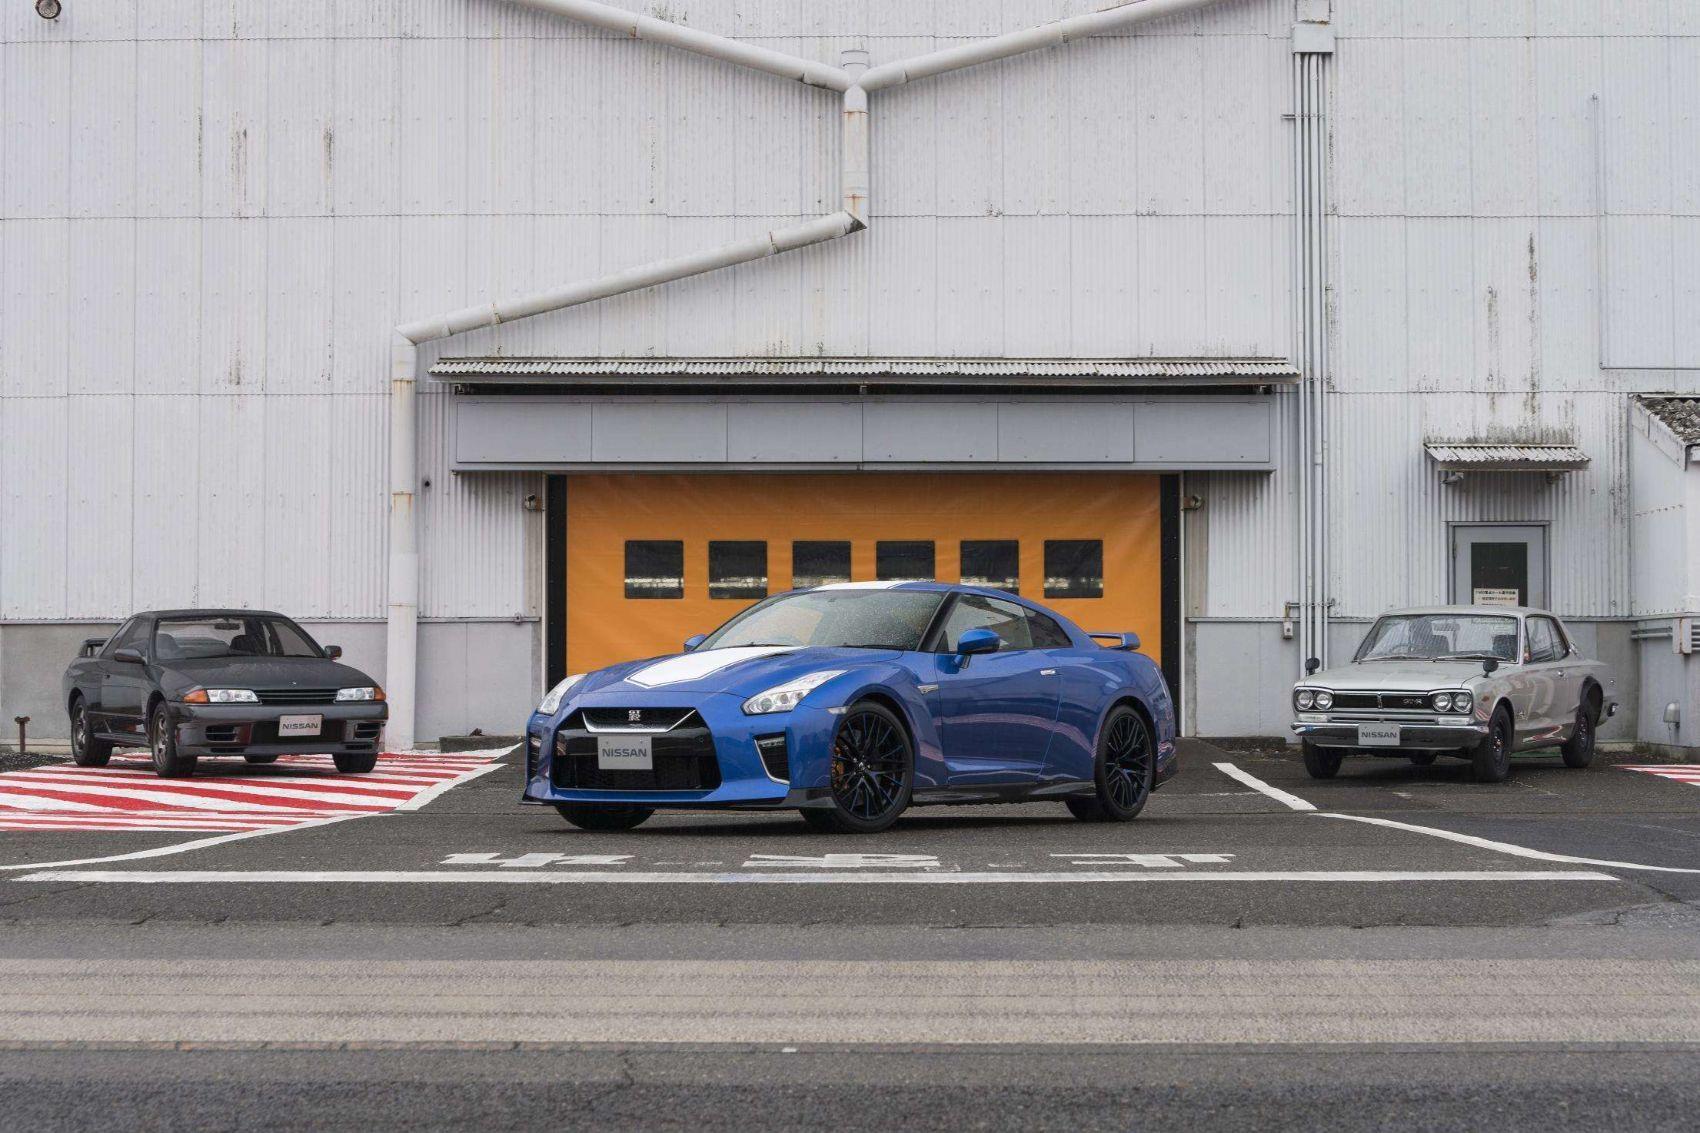 2020 Nissan Gt R 50th Anniversary Gt R Nismo Godzilla Gets Bigger